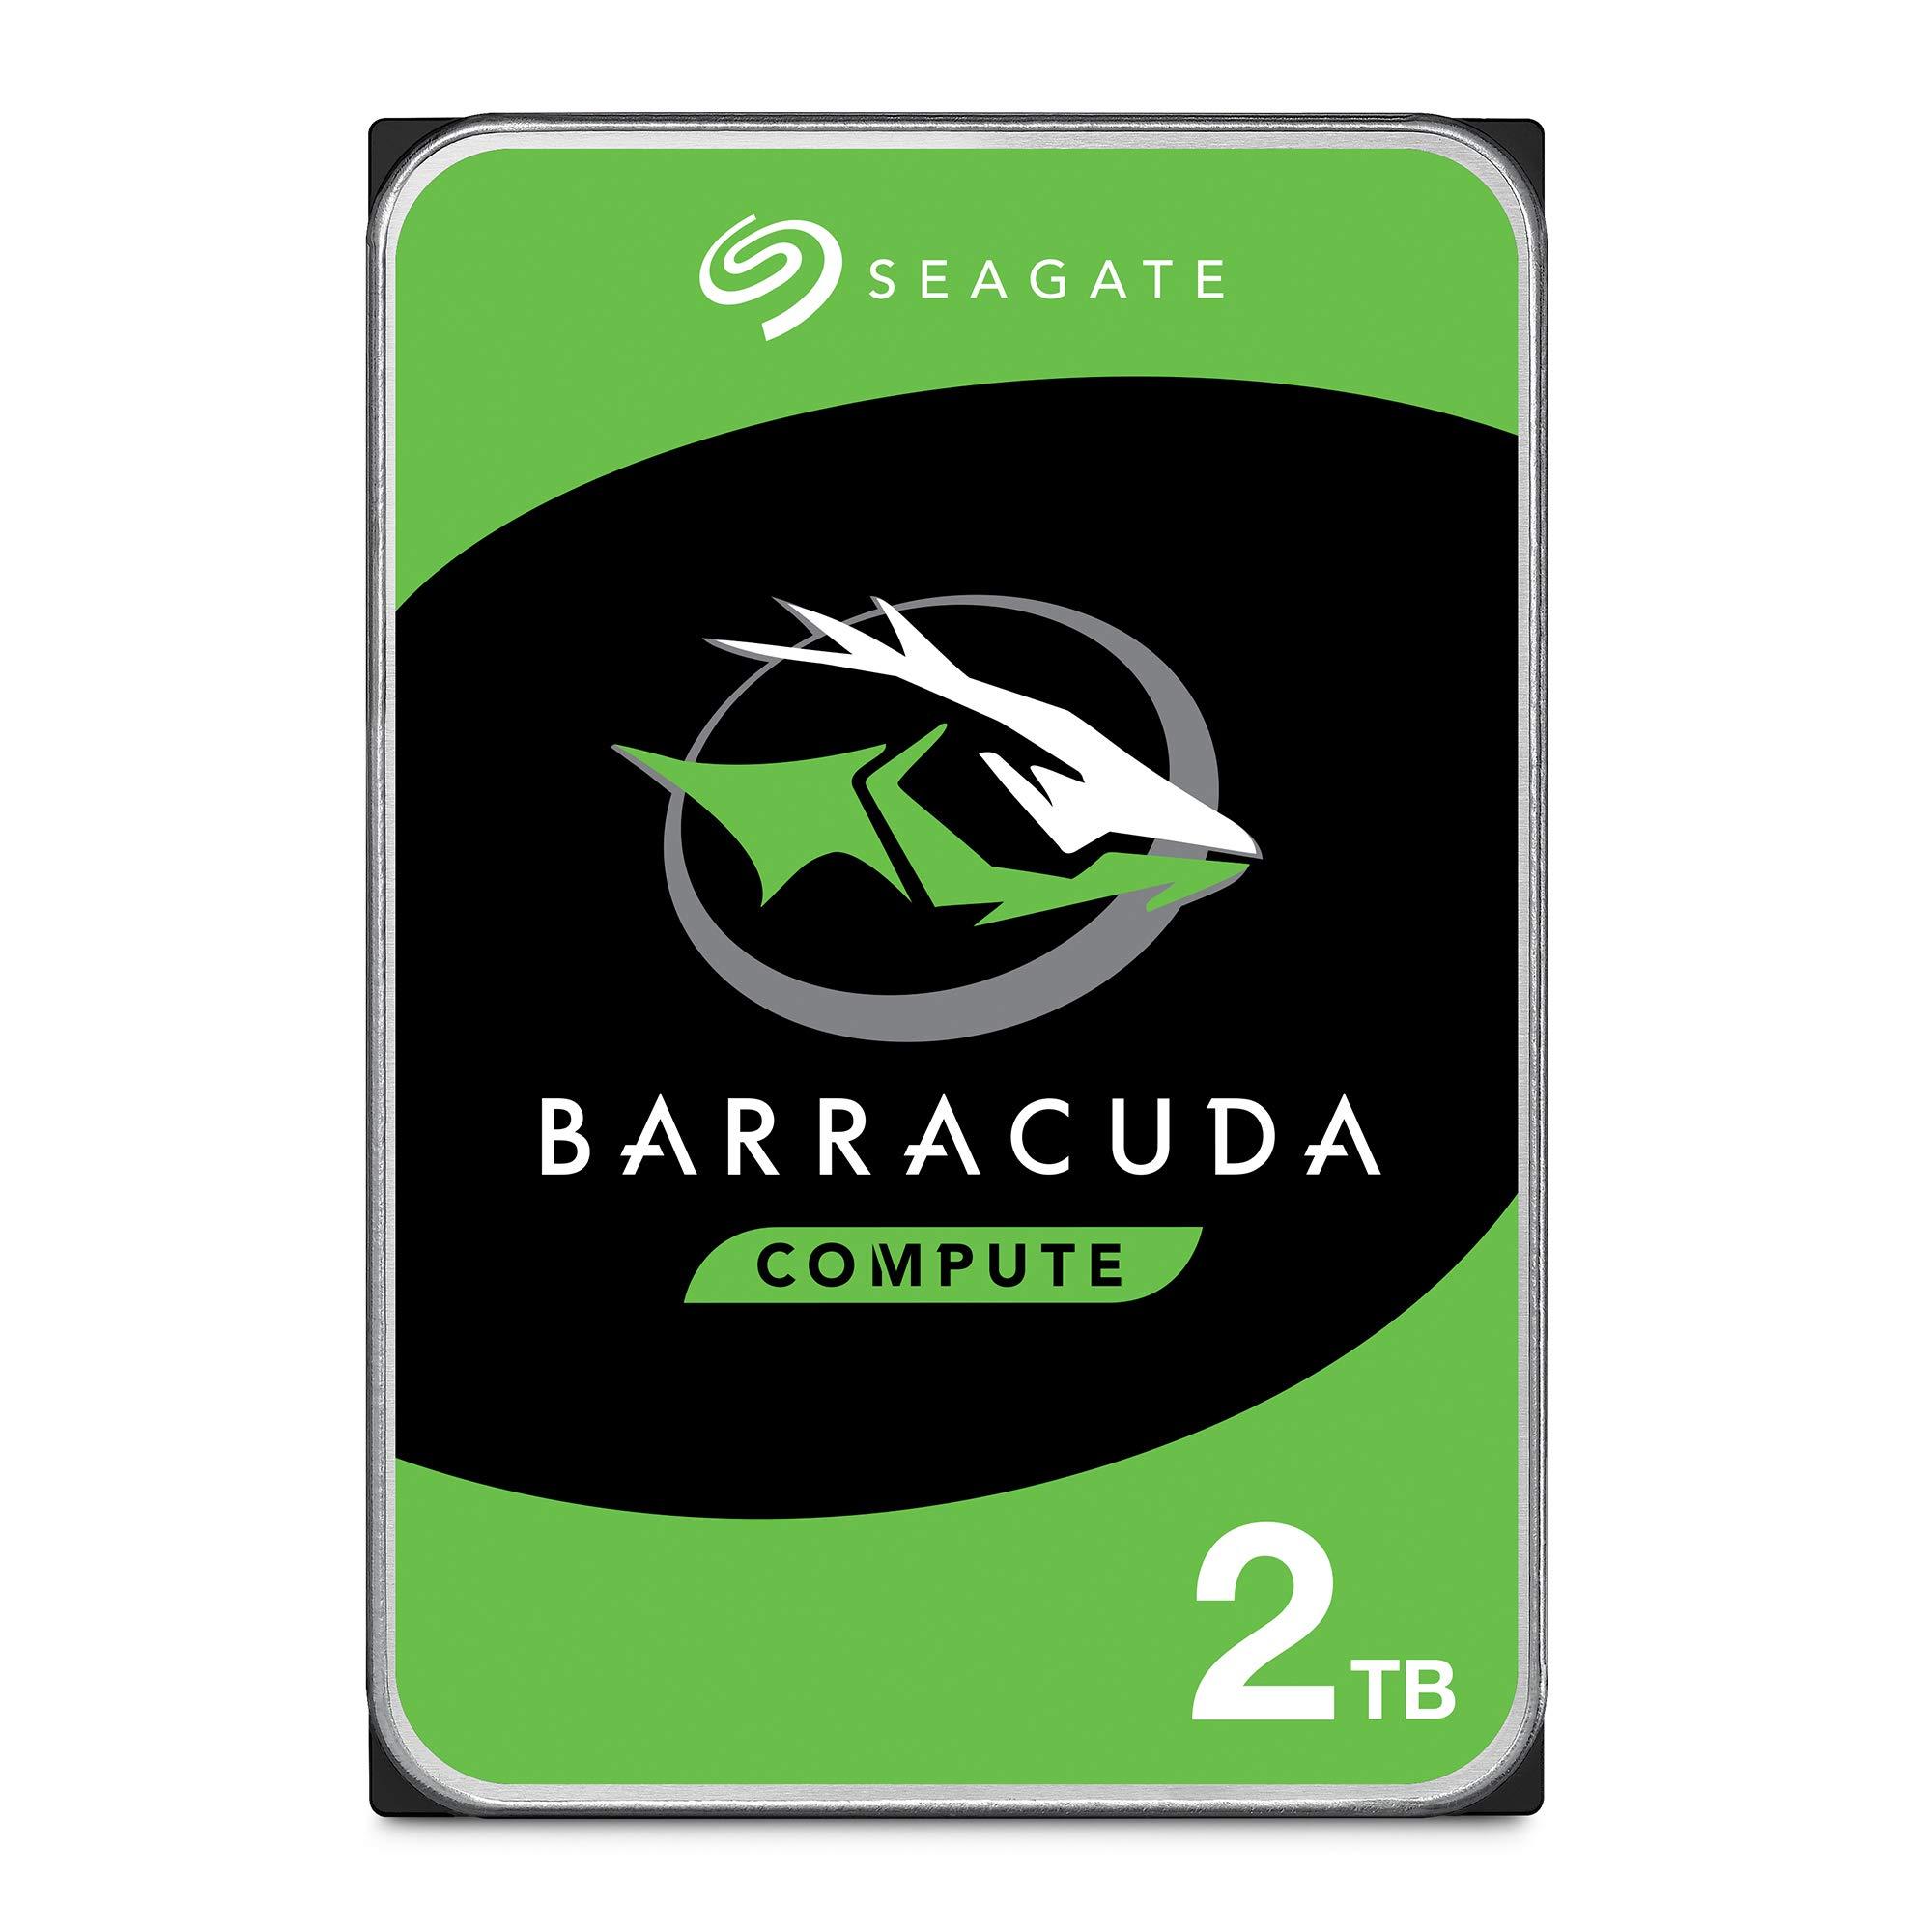 Seagate BarraCuda 2TB Internal Hard Drive HDD - 3.5 Inch SATA 6Gb/s 7200 RPM 256MB Cache 3.5-Inch - Frustration Free Packaging (ST2000DM008)